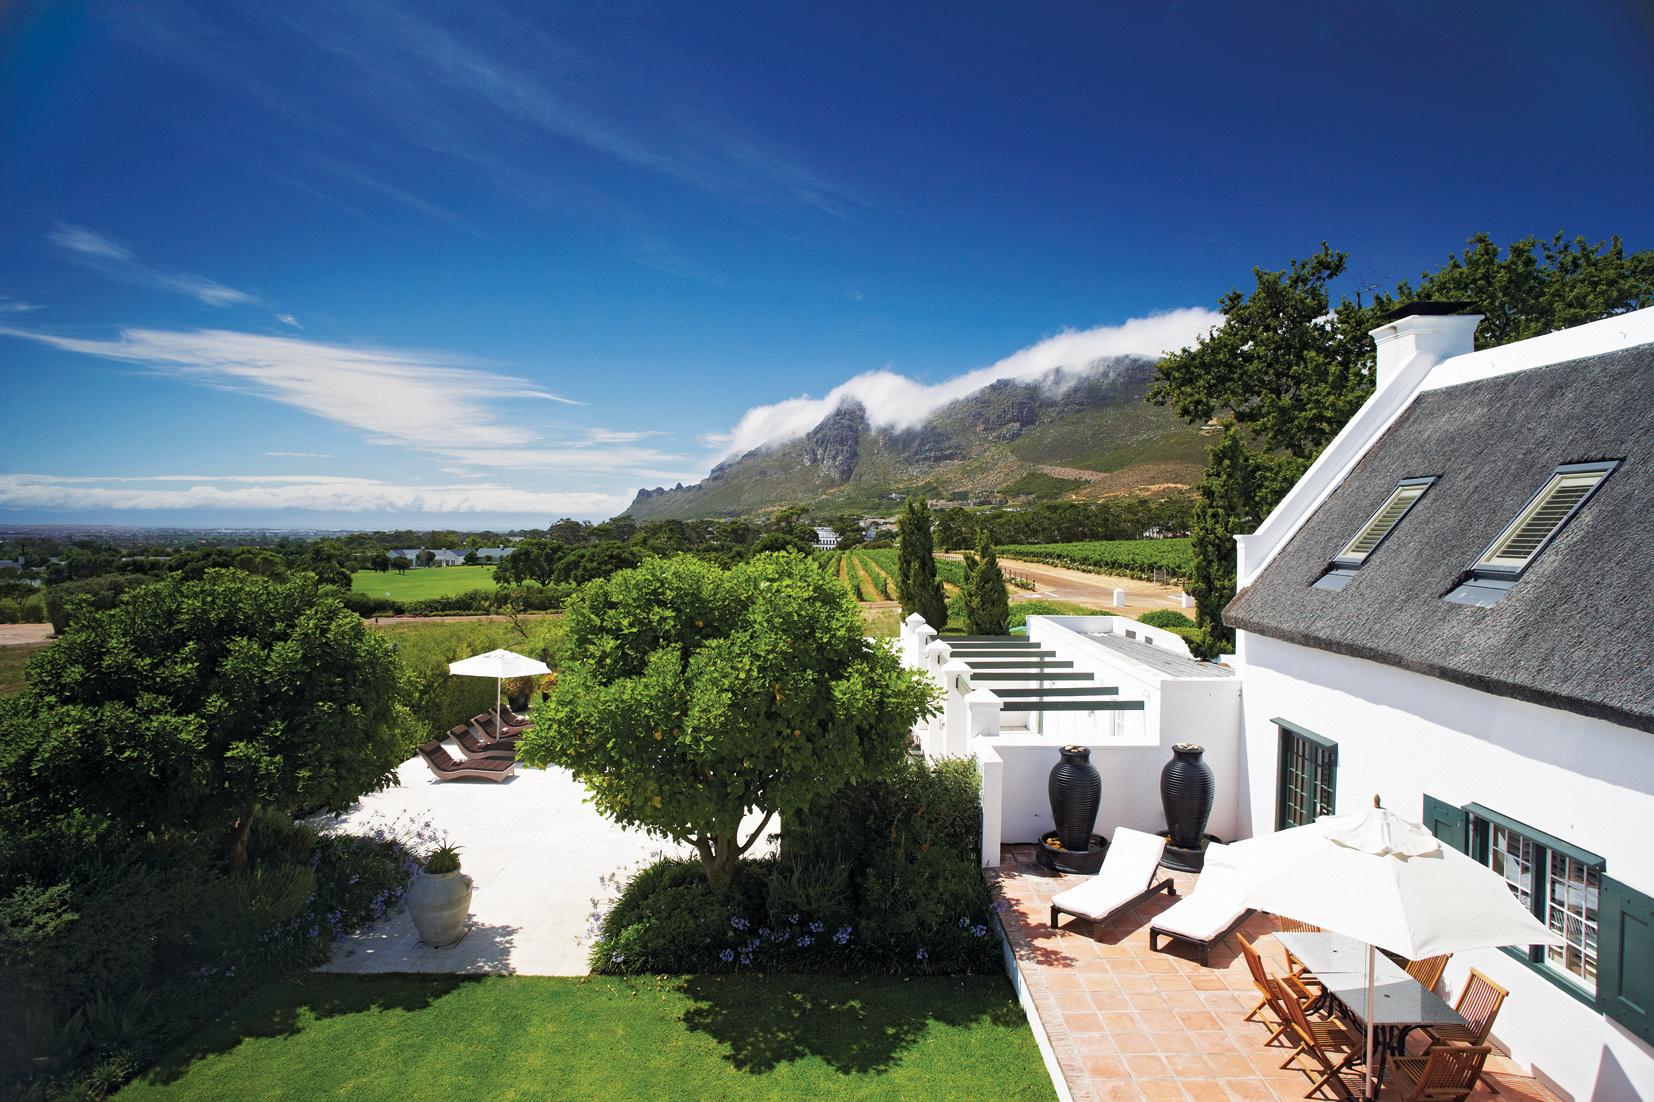 Steenberg-hotel-luxury-holiday